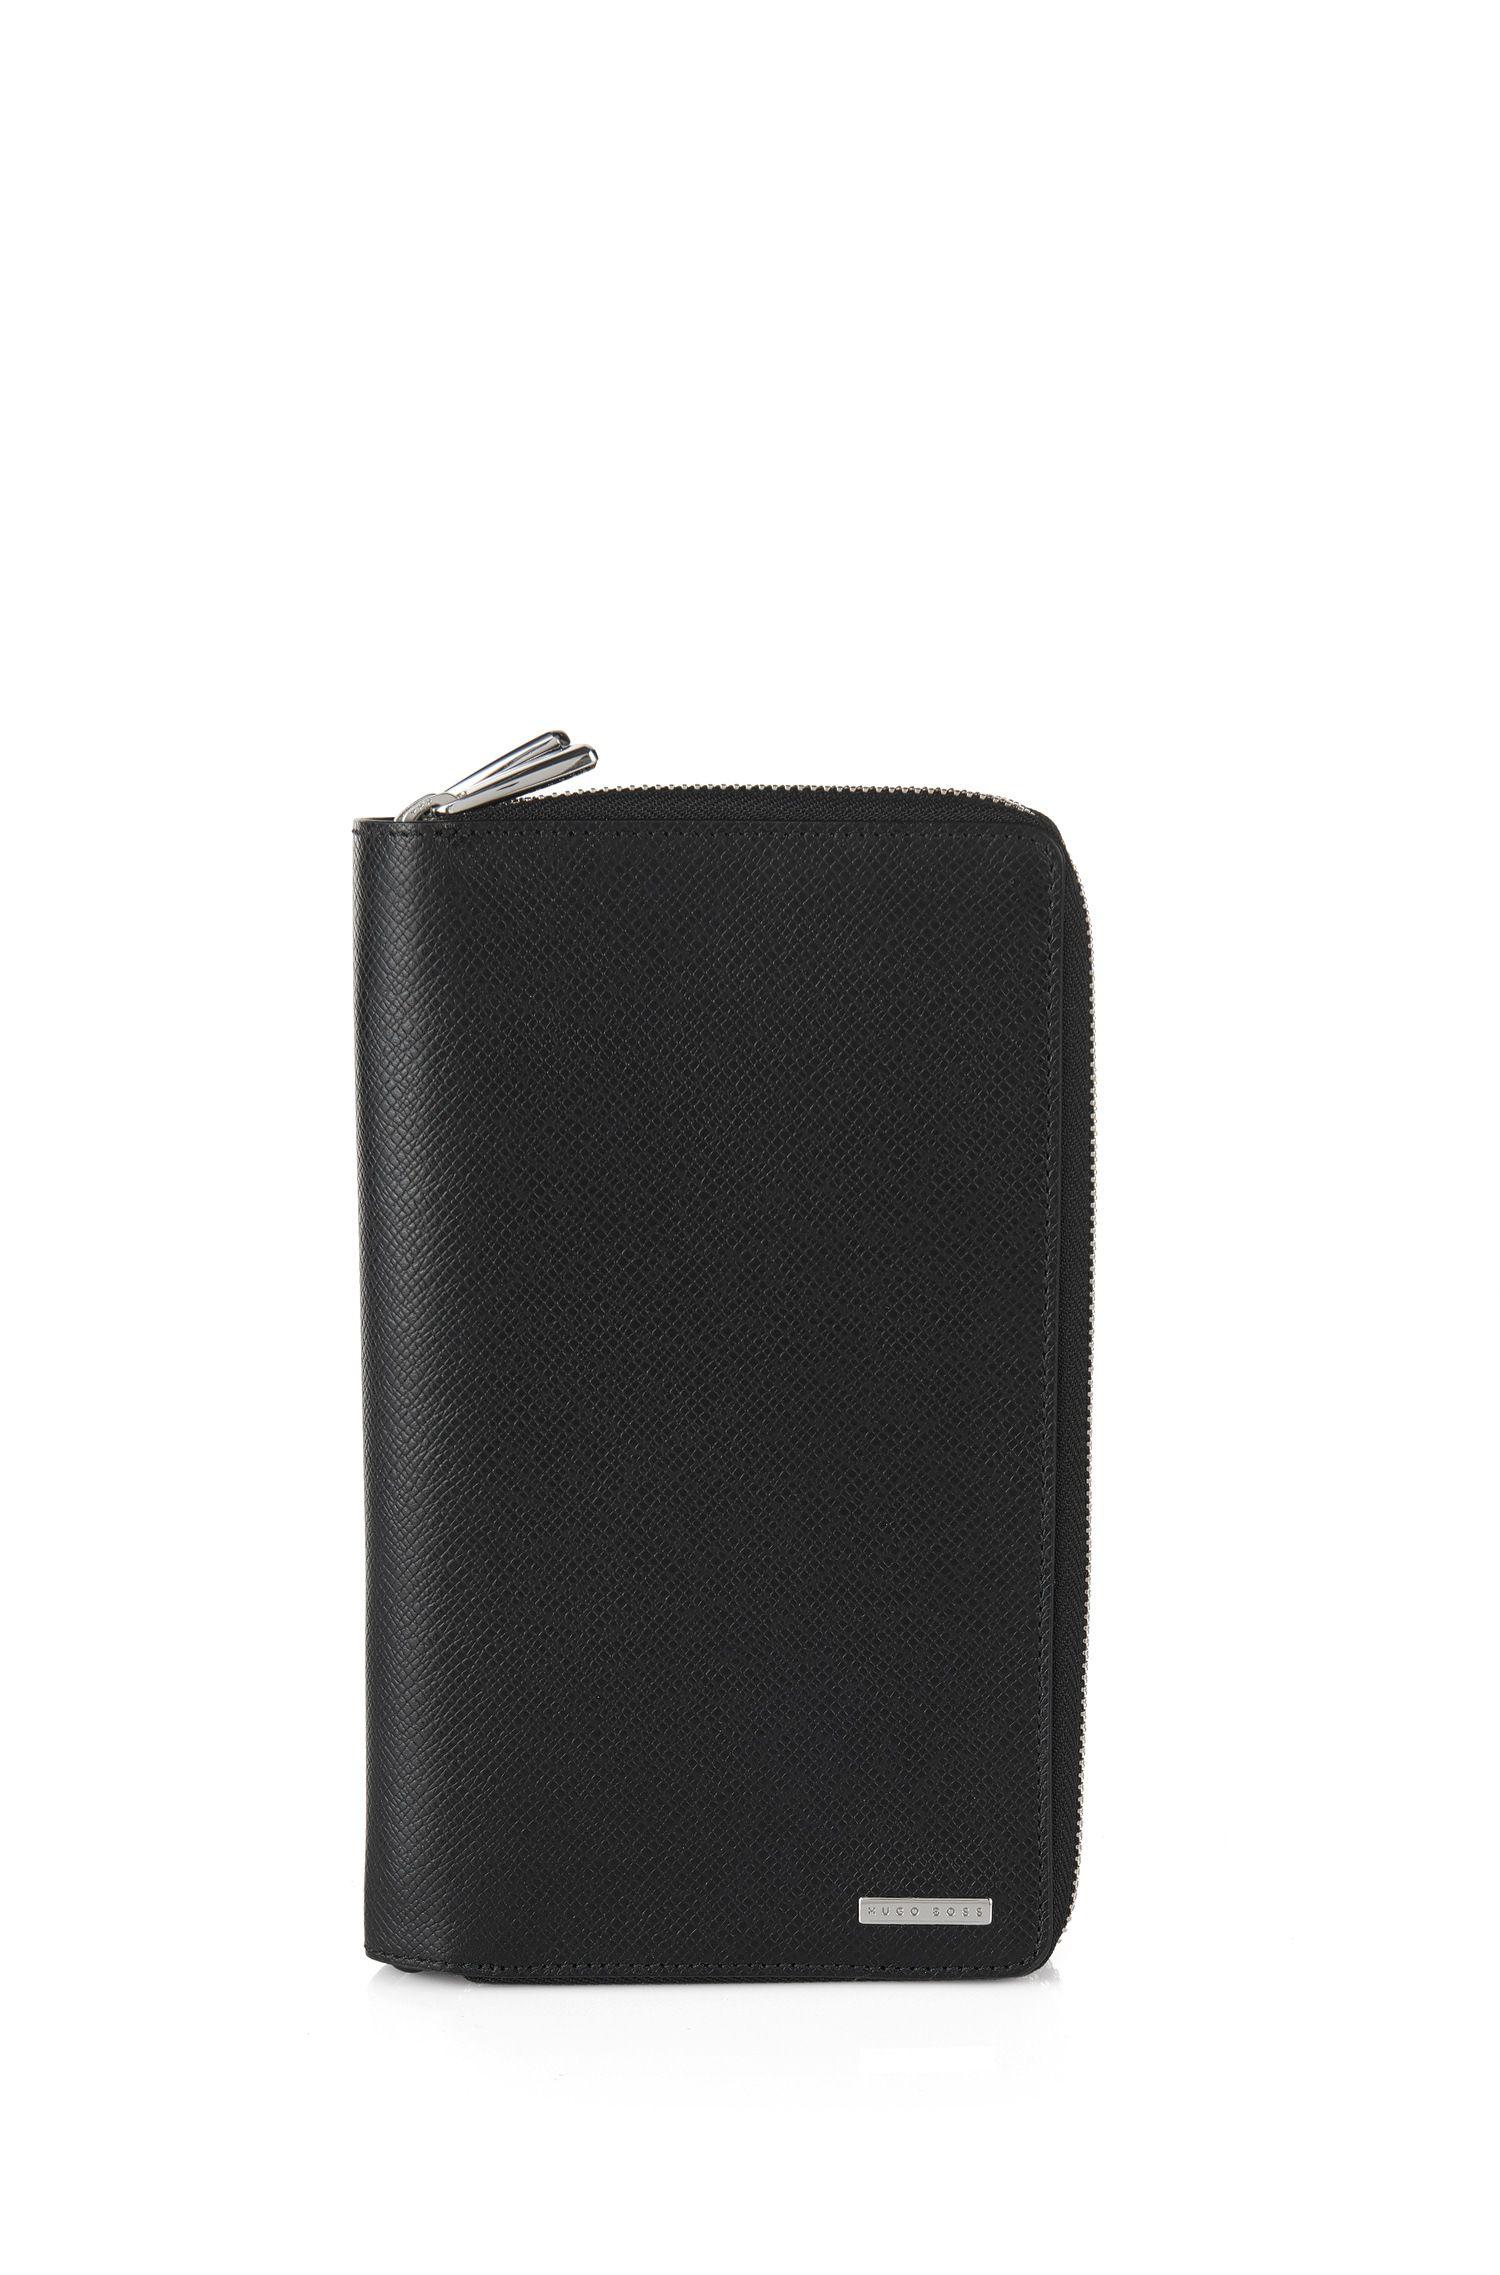 'Signature_D Zip Trav' | Leather Travel Organizer